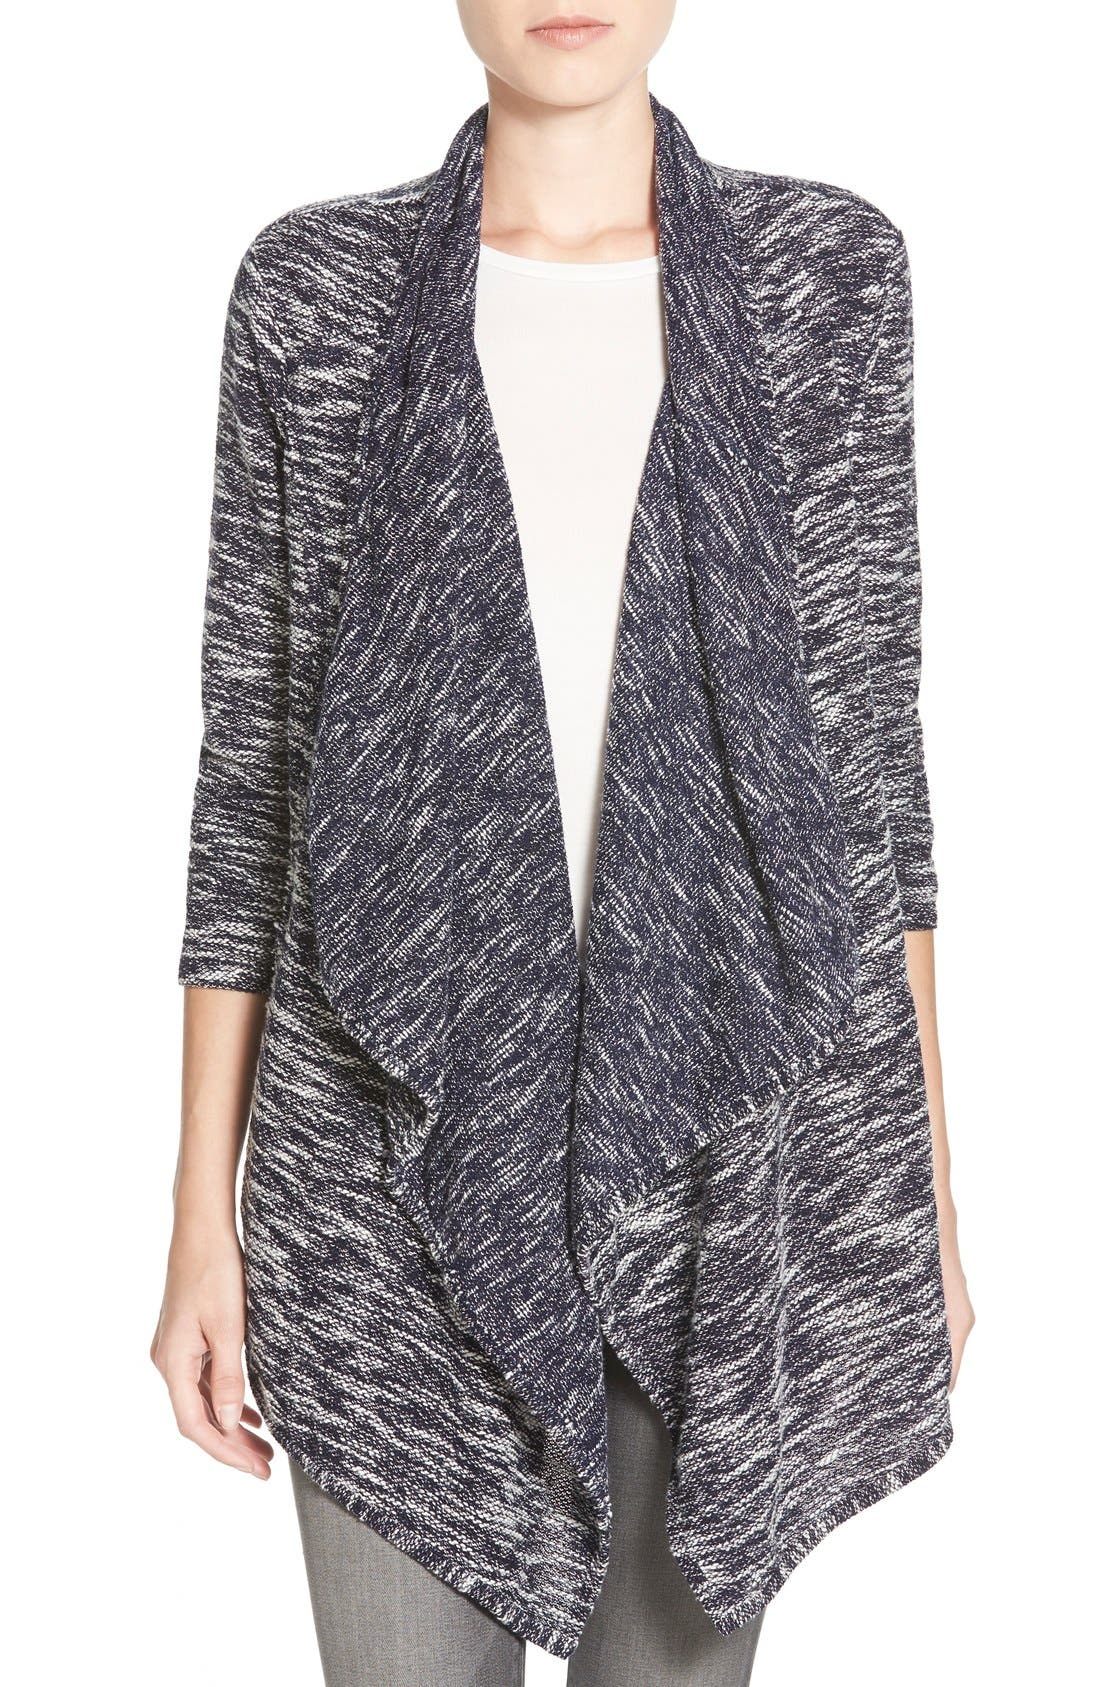 Alternate Image 1 Selected - Caslon® Drape Front Cardigan (Regular & Petite)